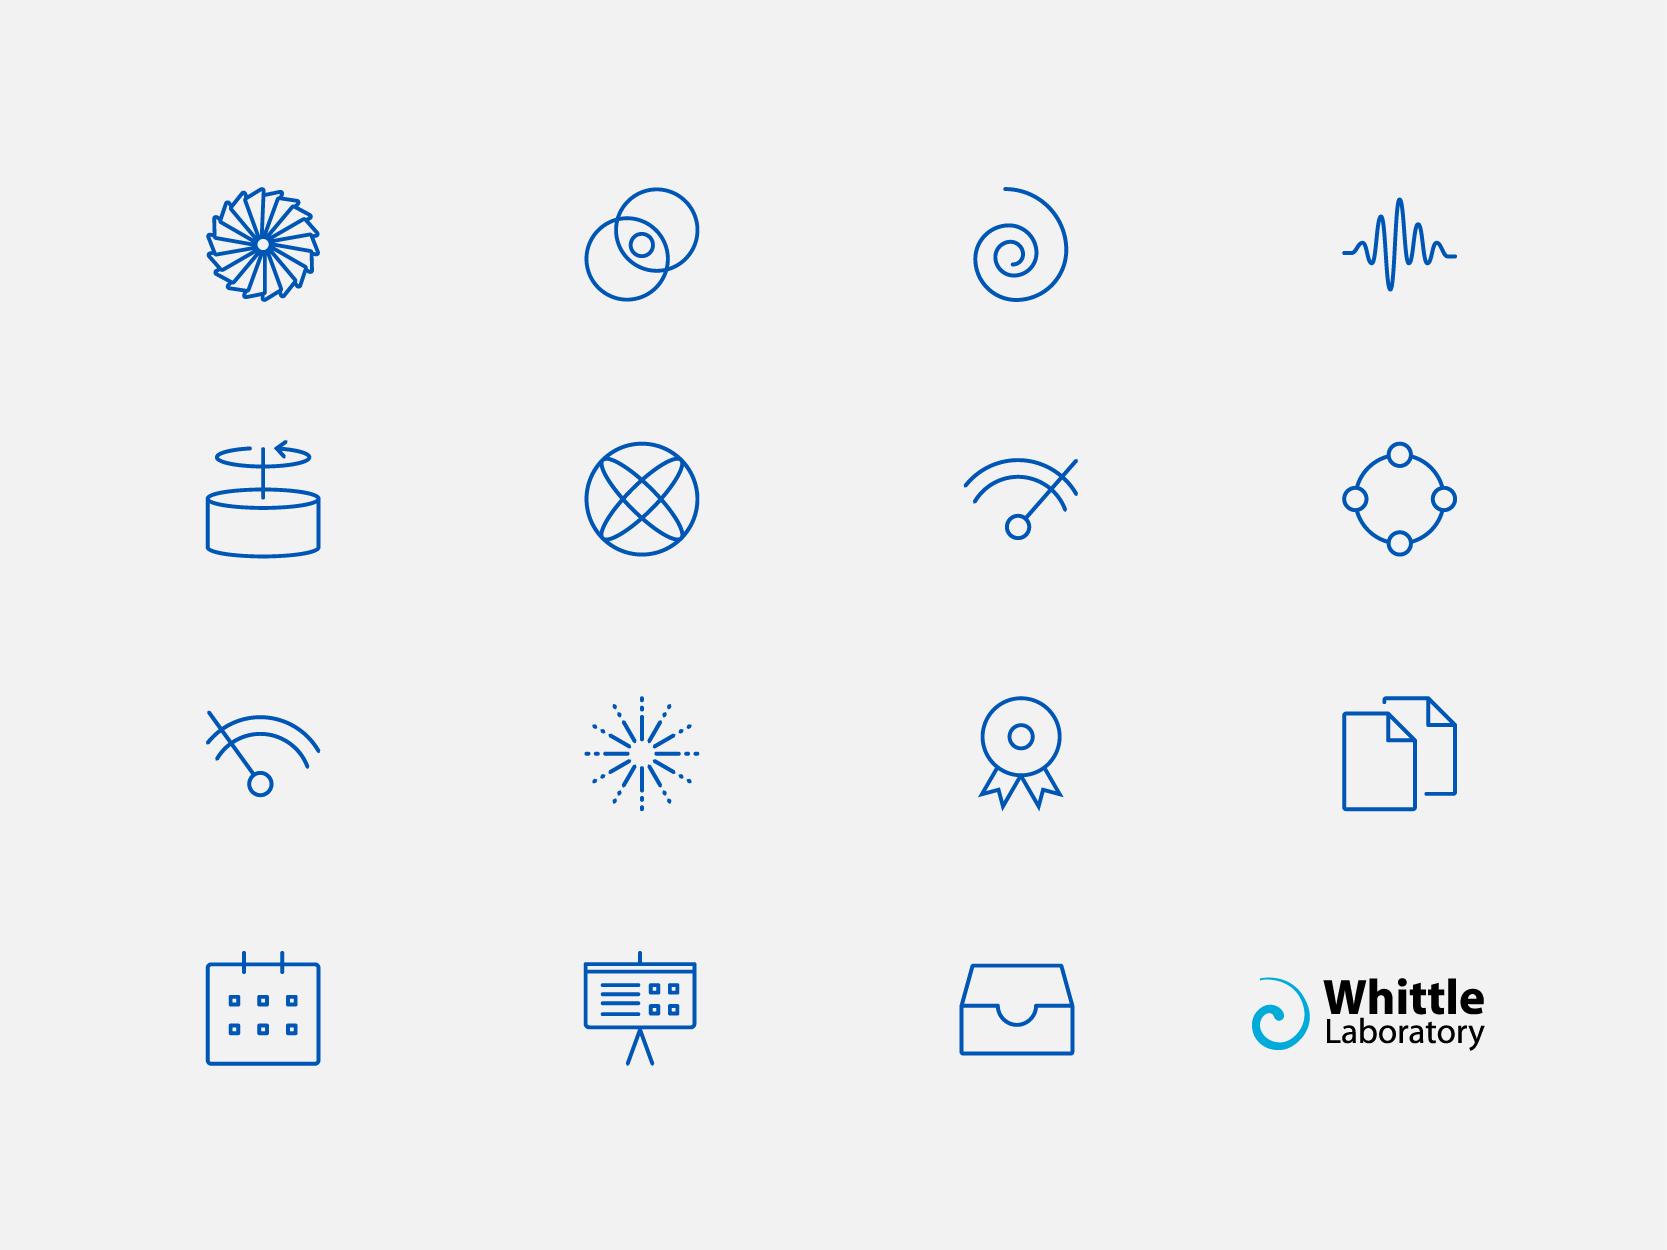 Whittle laboratory icon set, by Chiara Mensa for Onespacemedia